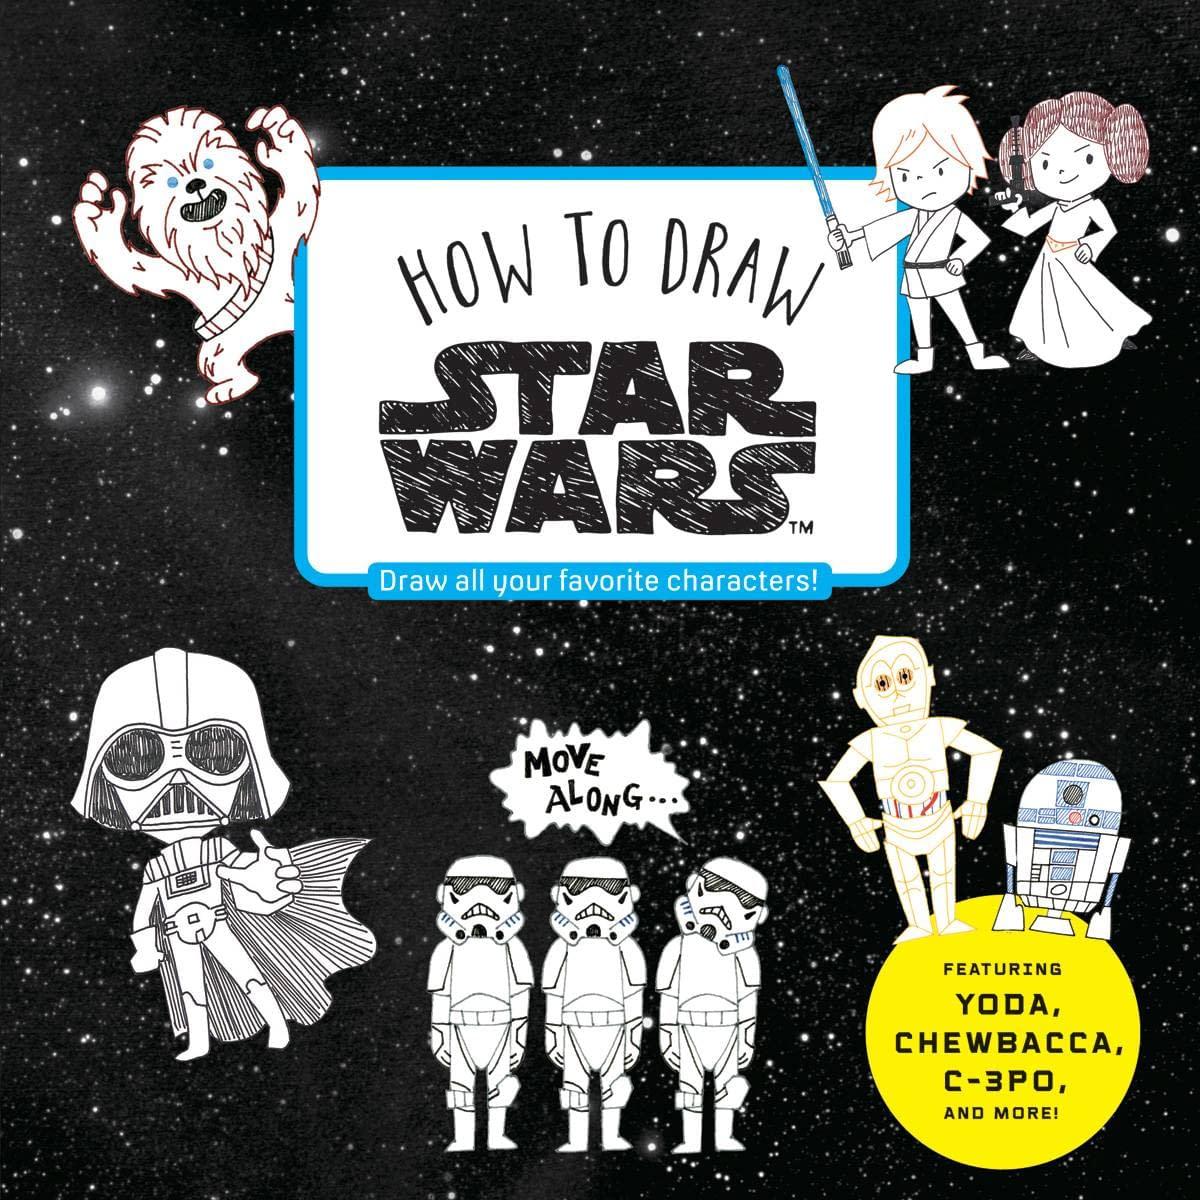 HOW TO DRAW STAR WARS SC